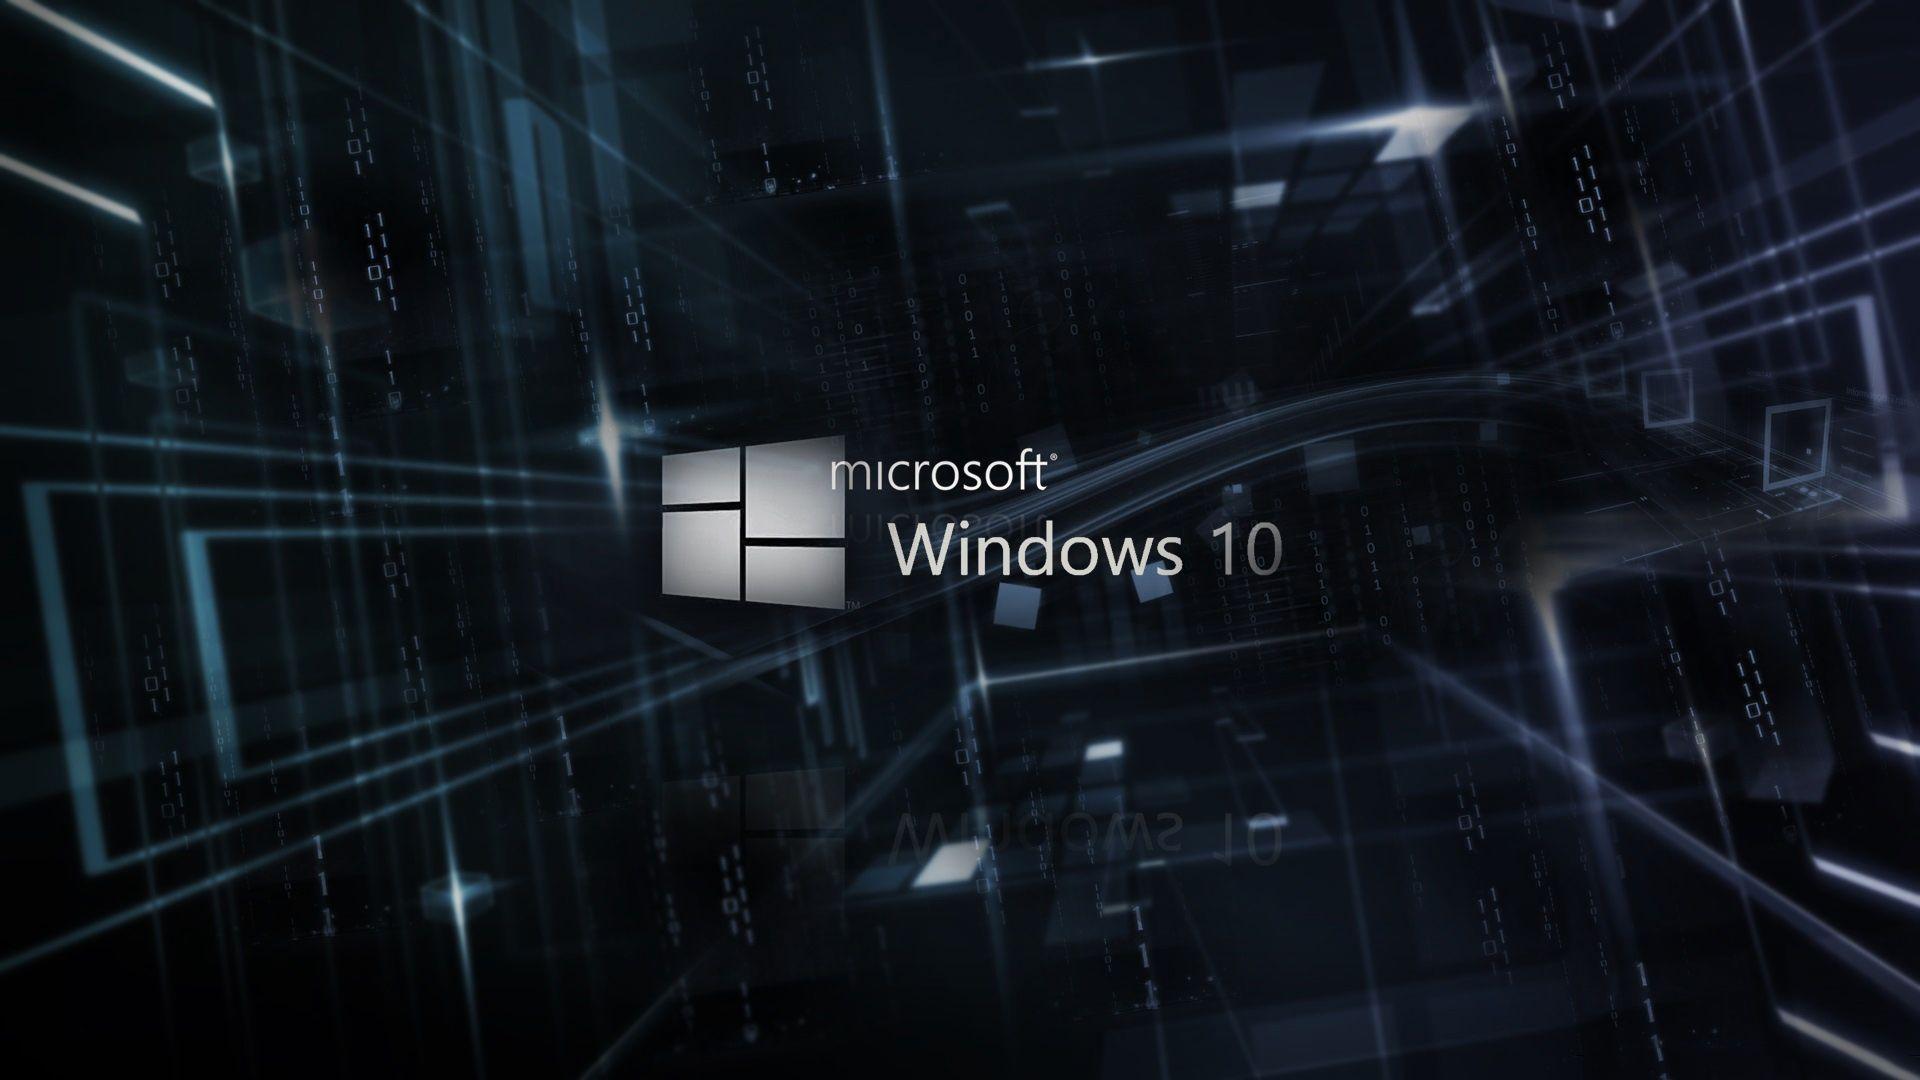 Windows 10 Hd Wallpapers Http Gadgets Saqibsomal Com 2016 01 02